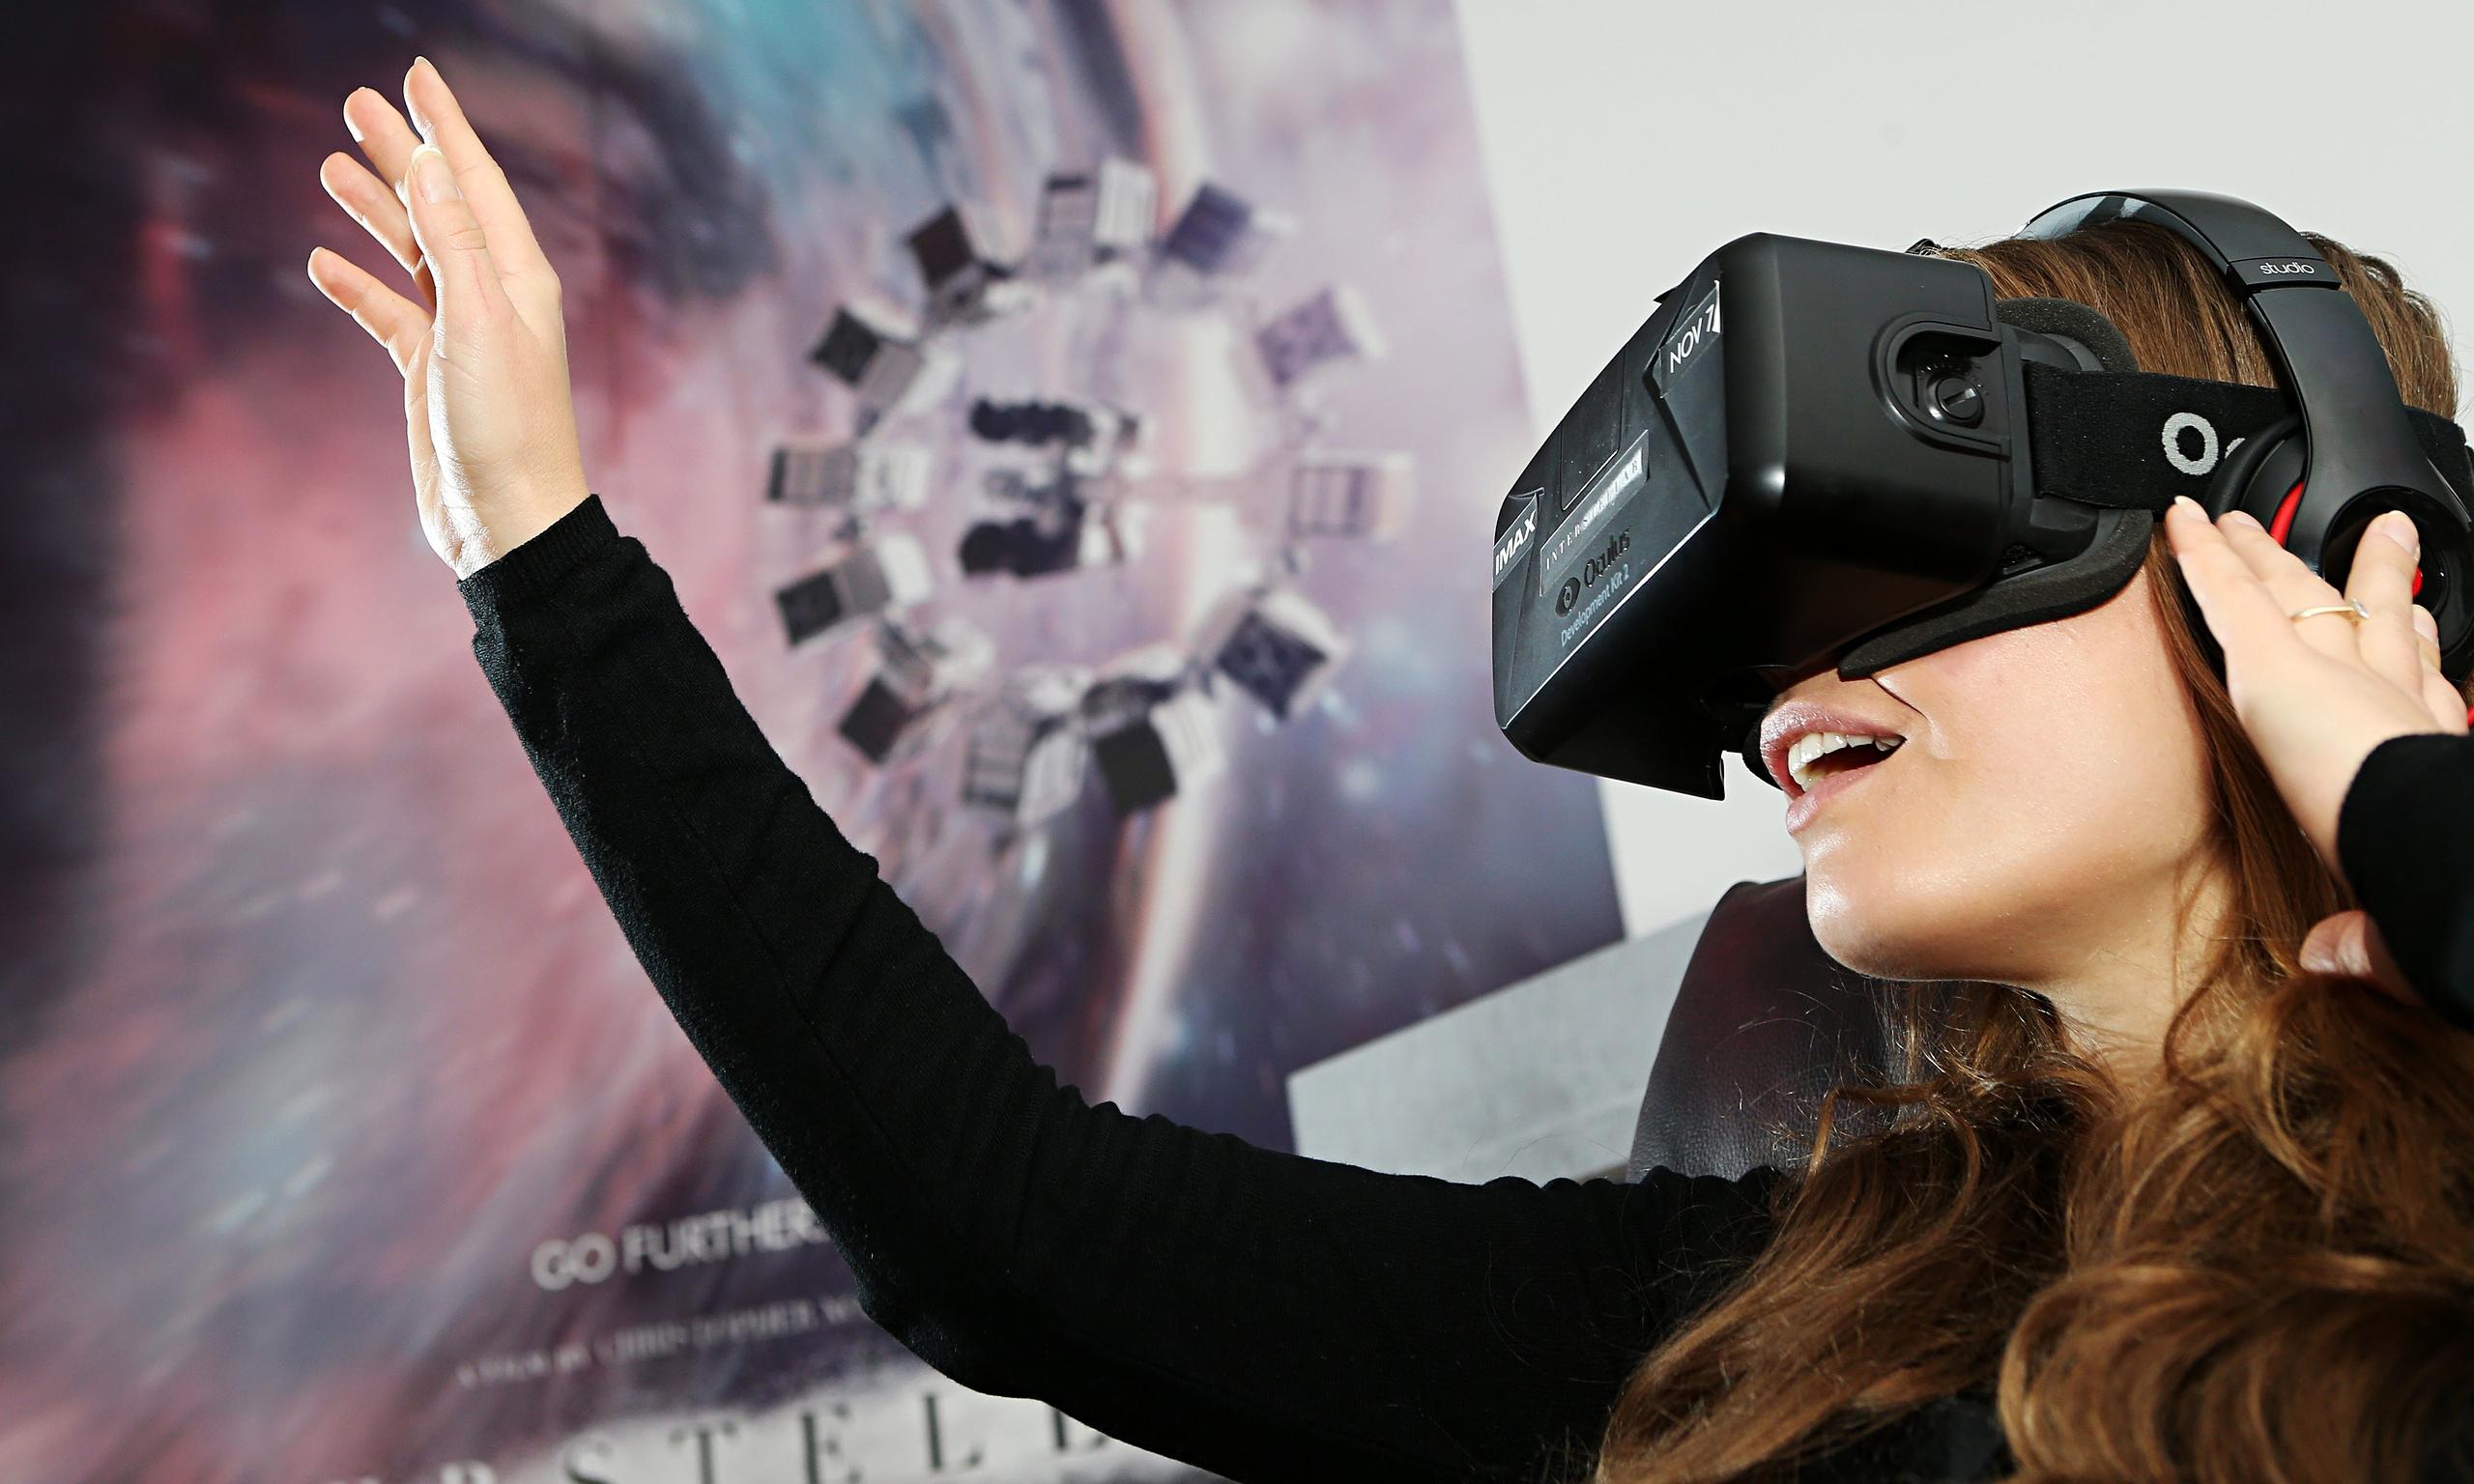 oculus, realidad virtual, virtual reality, nethunting